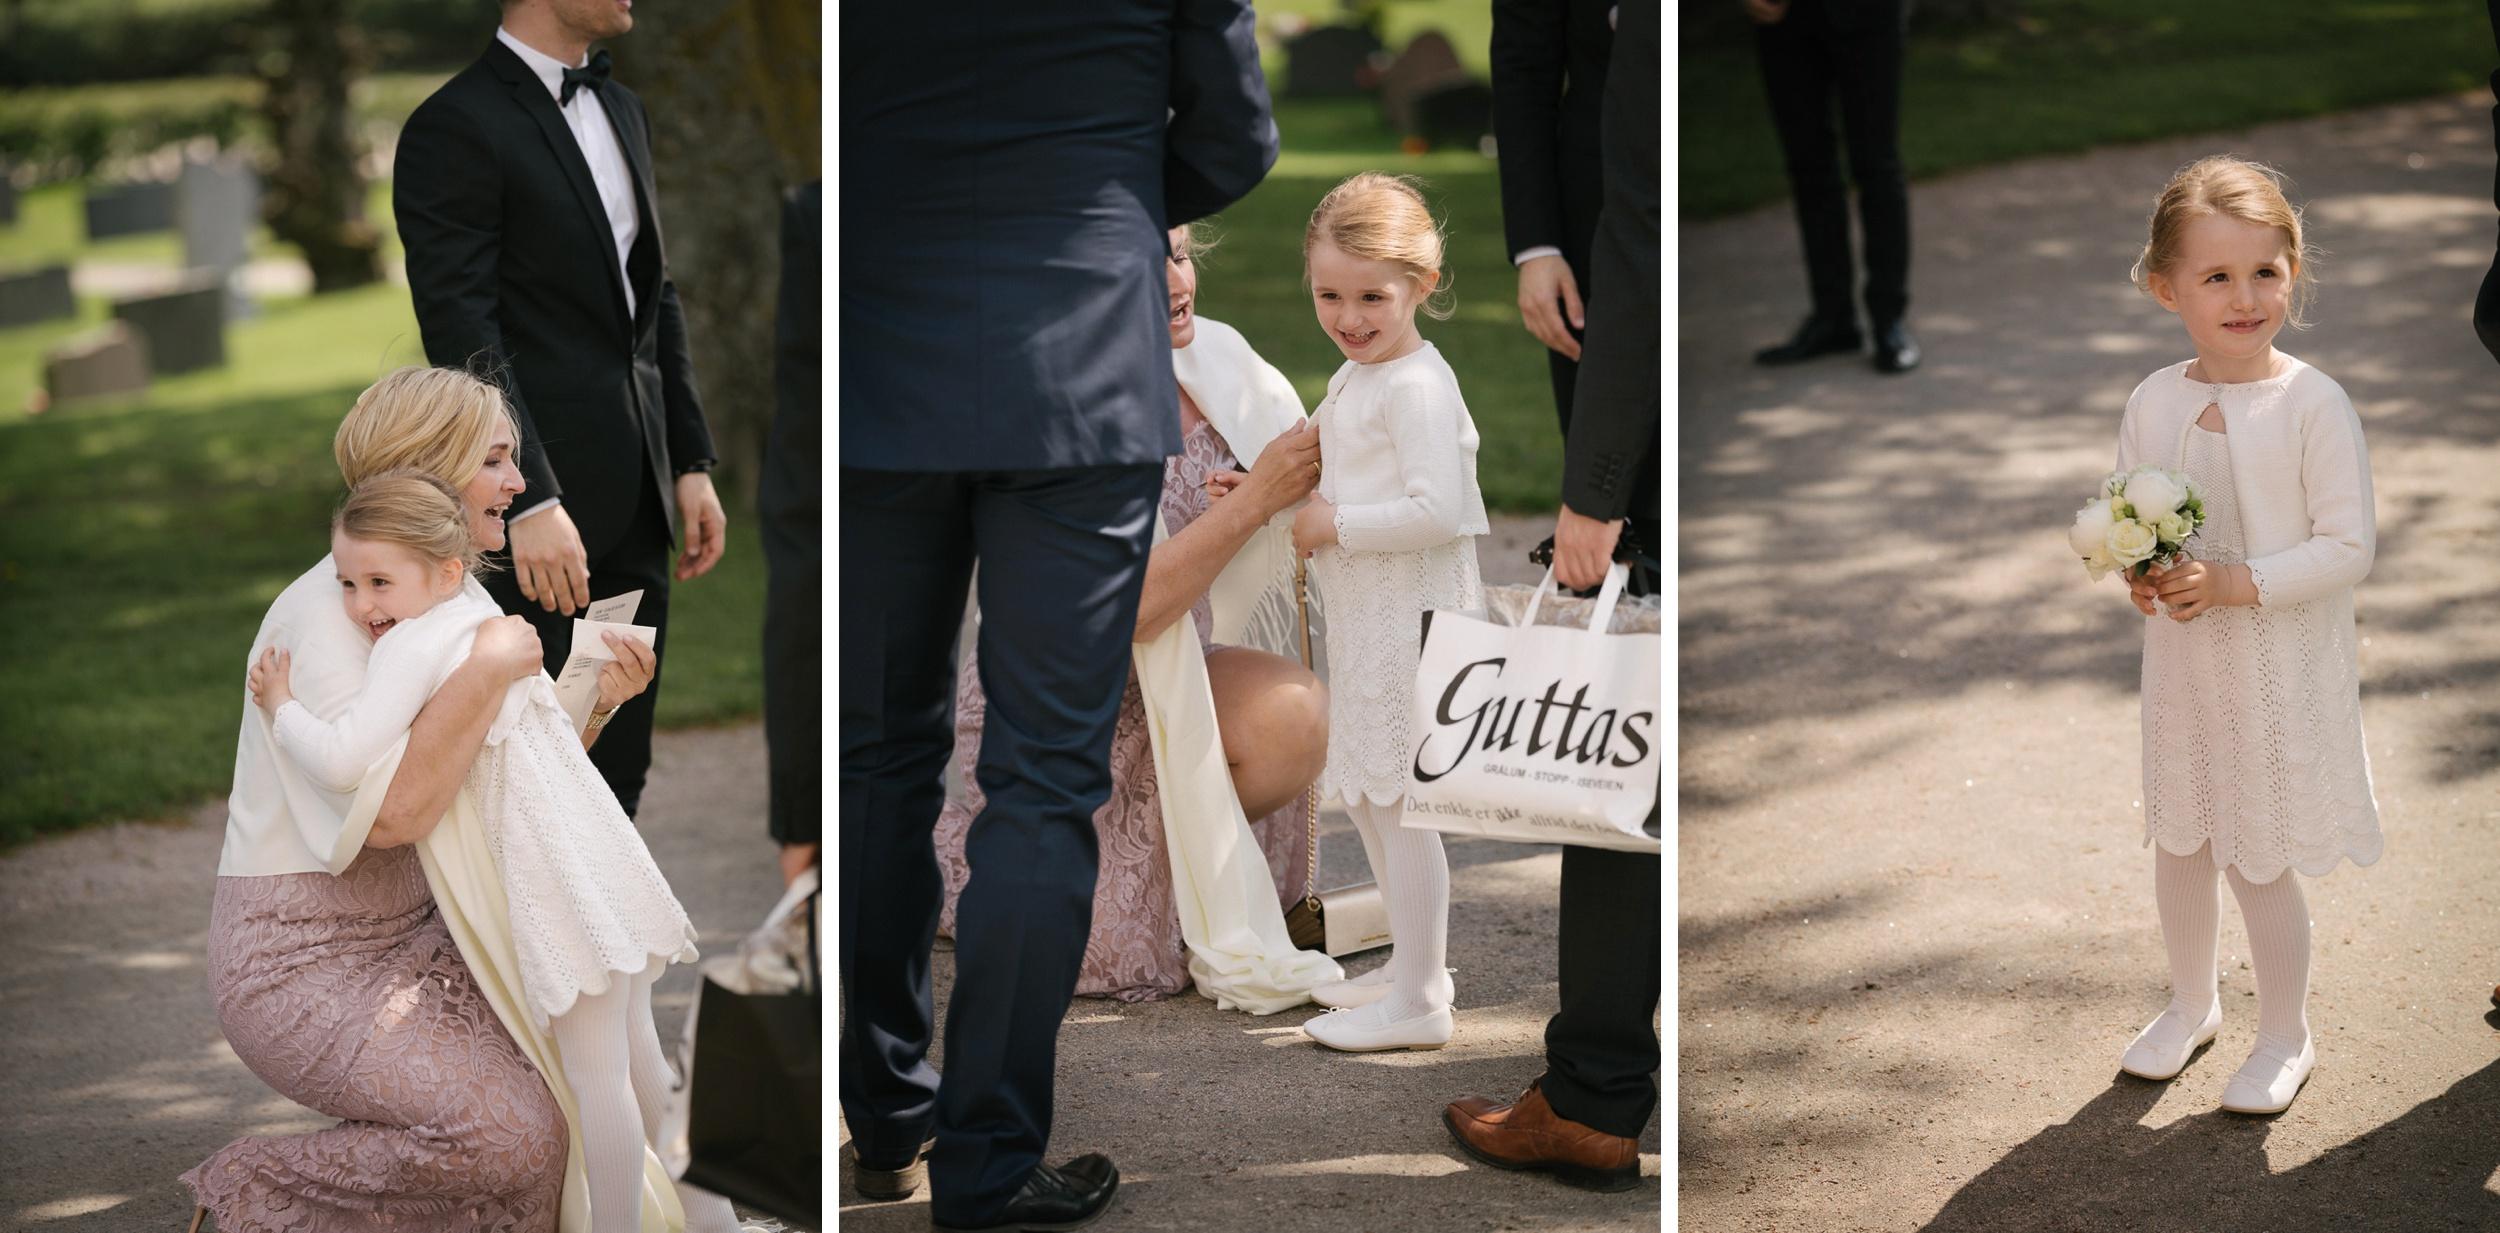 bryllup-bryllupsfotografering-bryllupsfotograf-sarpsborg-20170520-_H2A0156Camilla-og-ruben_WEB.jpg